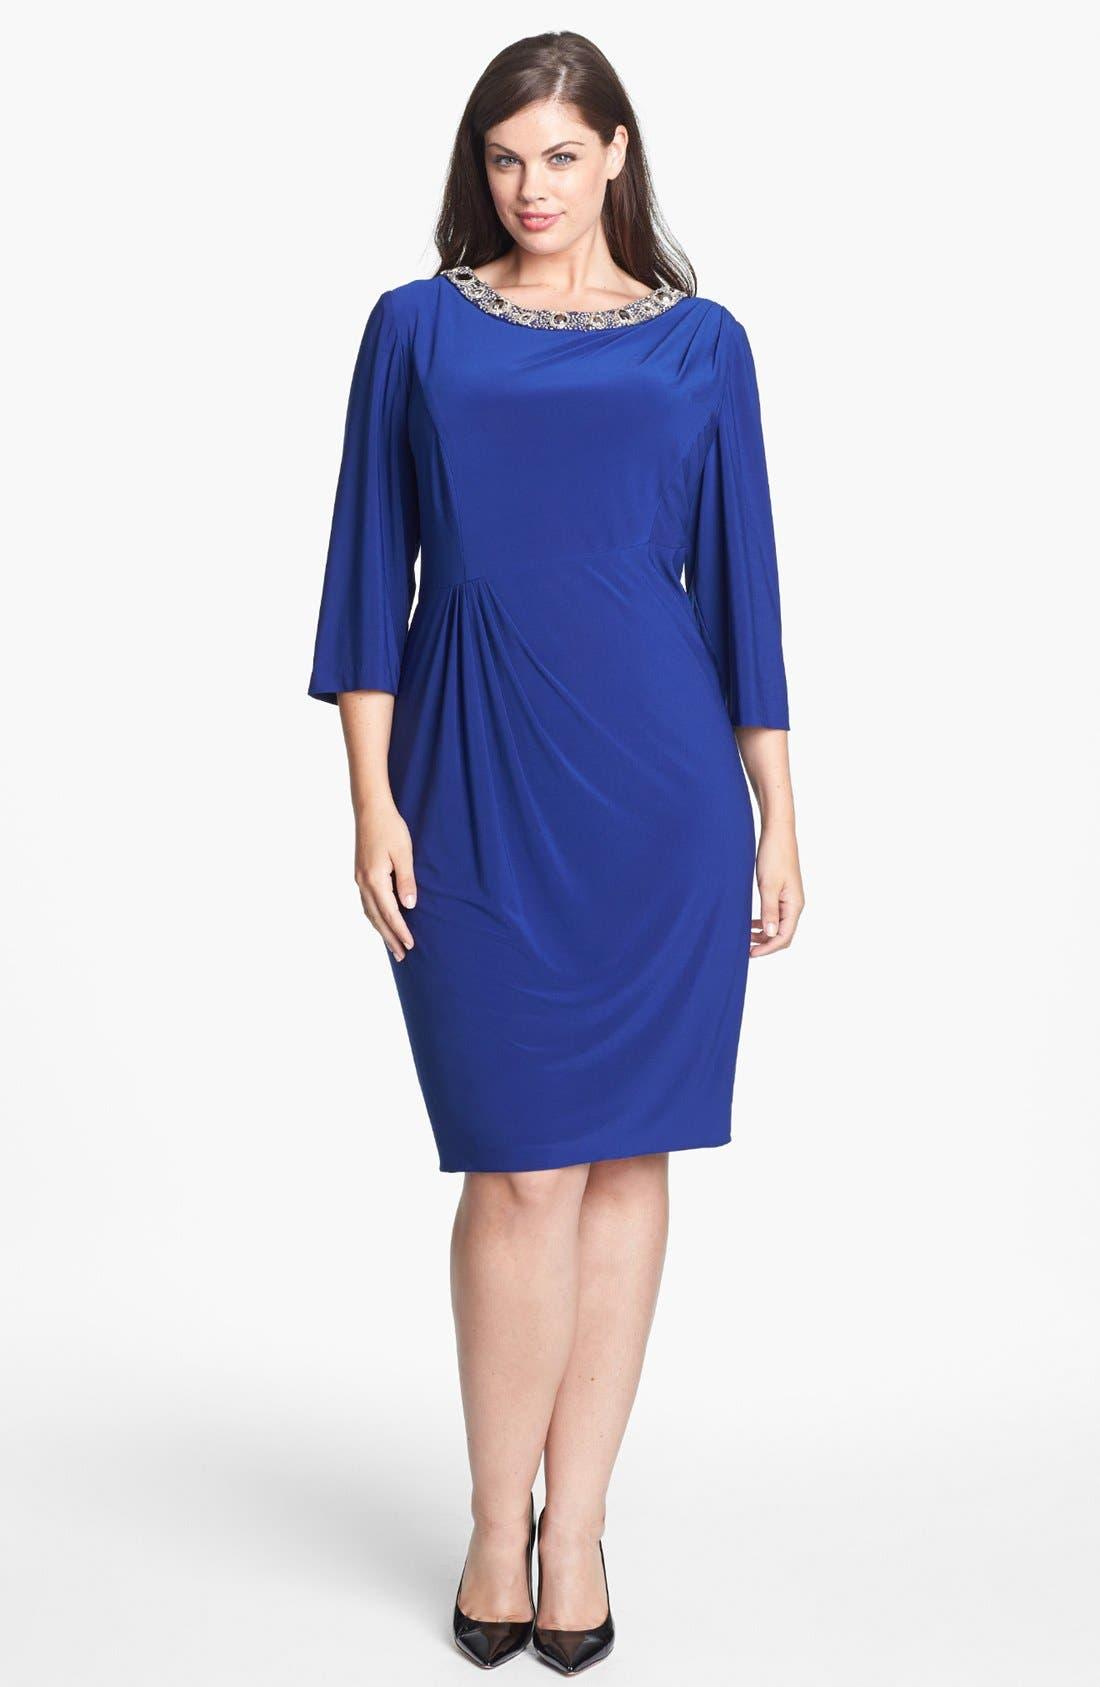 Main Image - Alex Evenings Embellished Side Draped Jersey Dress (Plus Size)